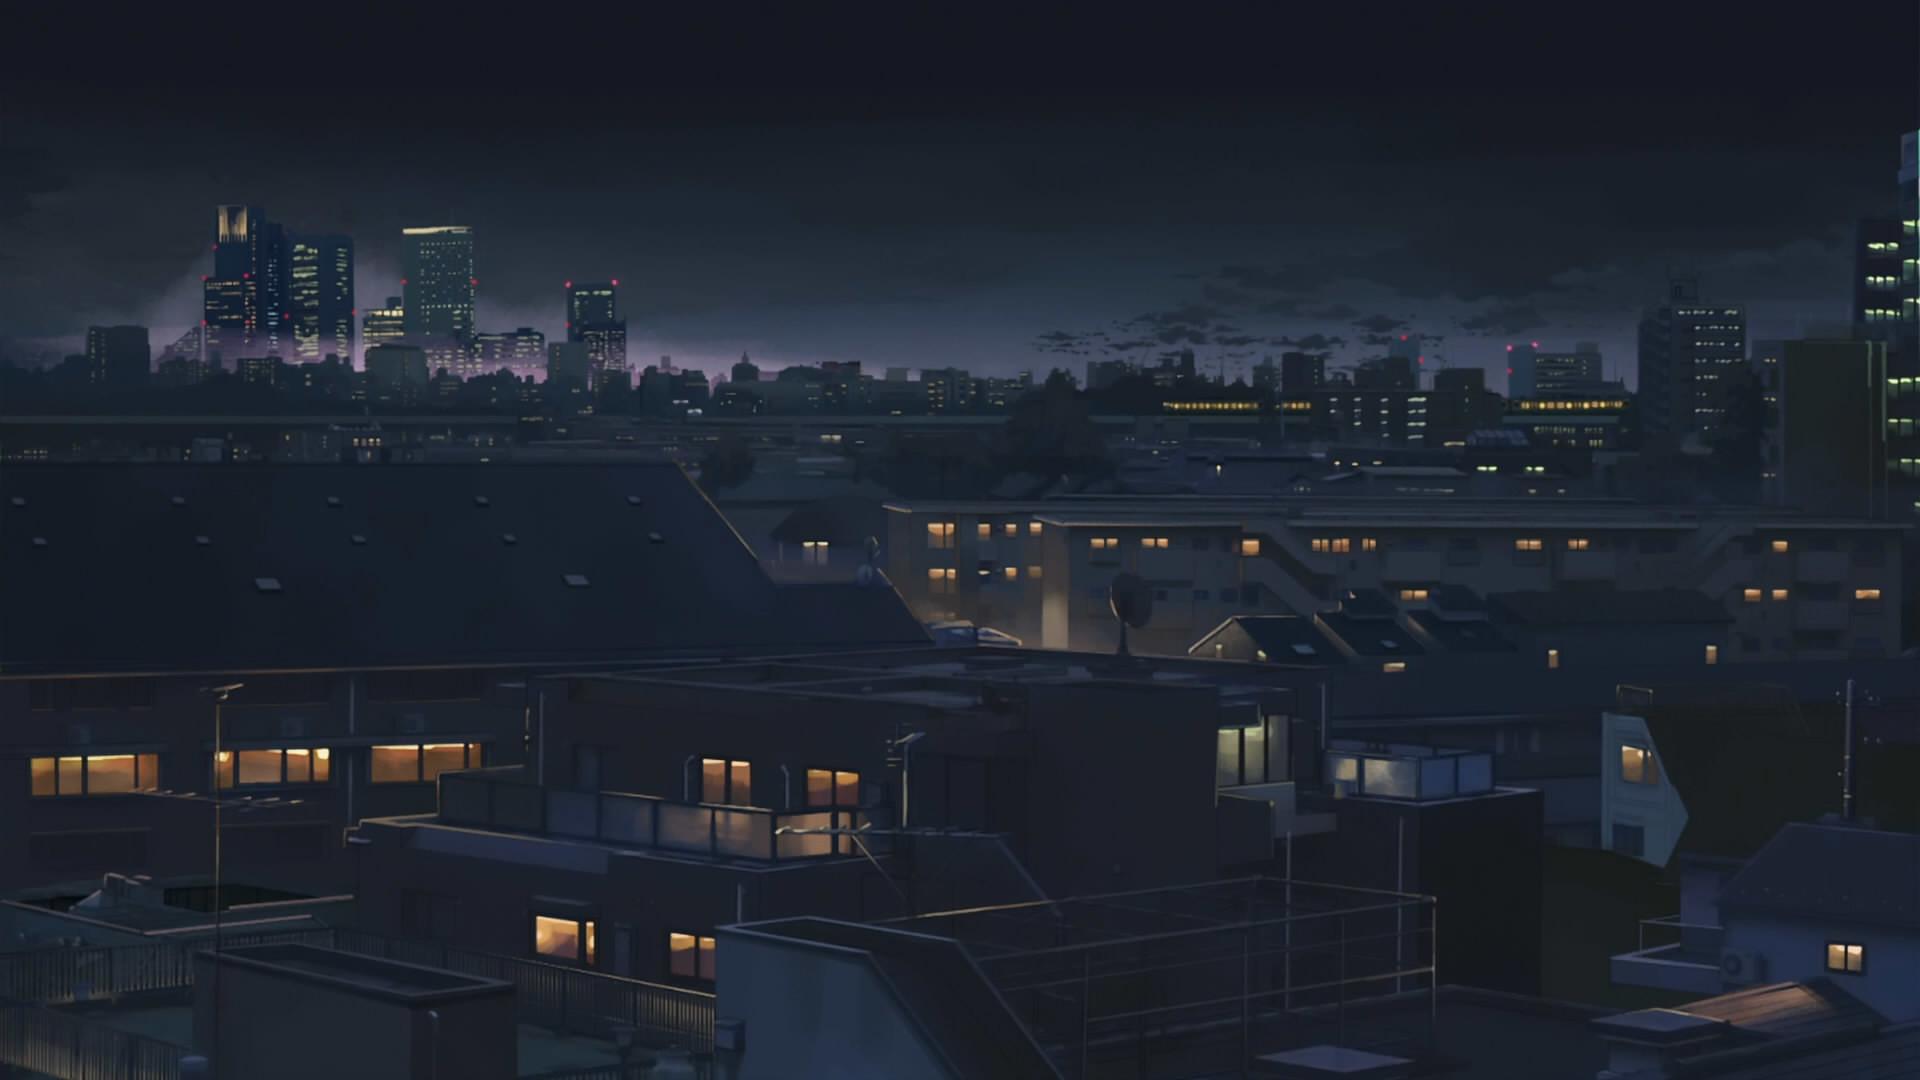 Anime City Desktop Wallpaper 50839